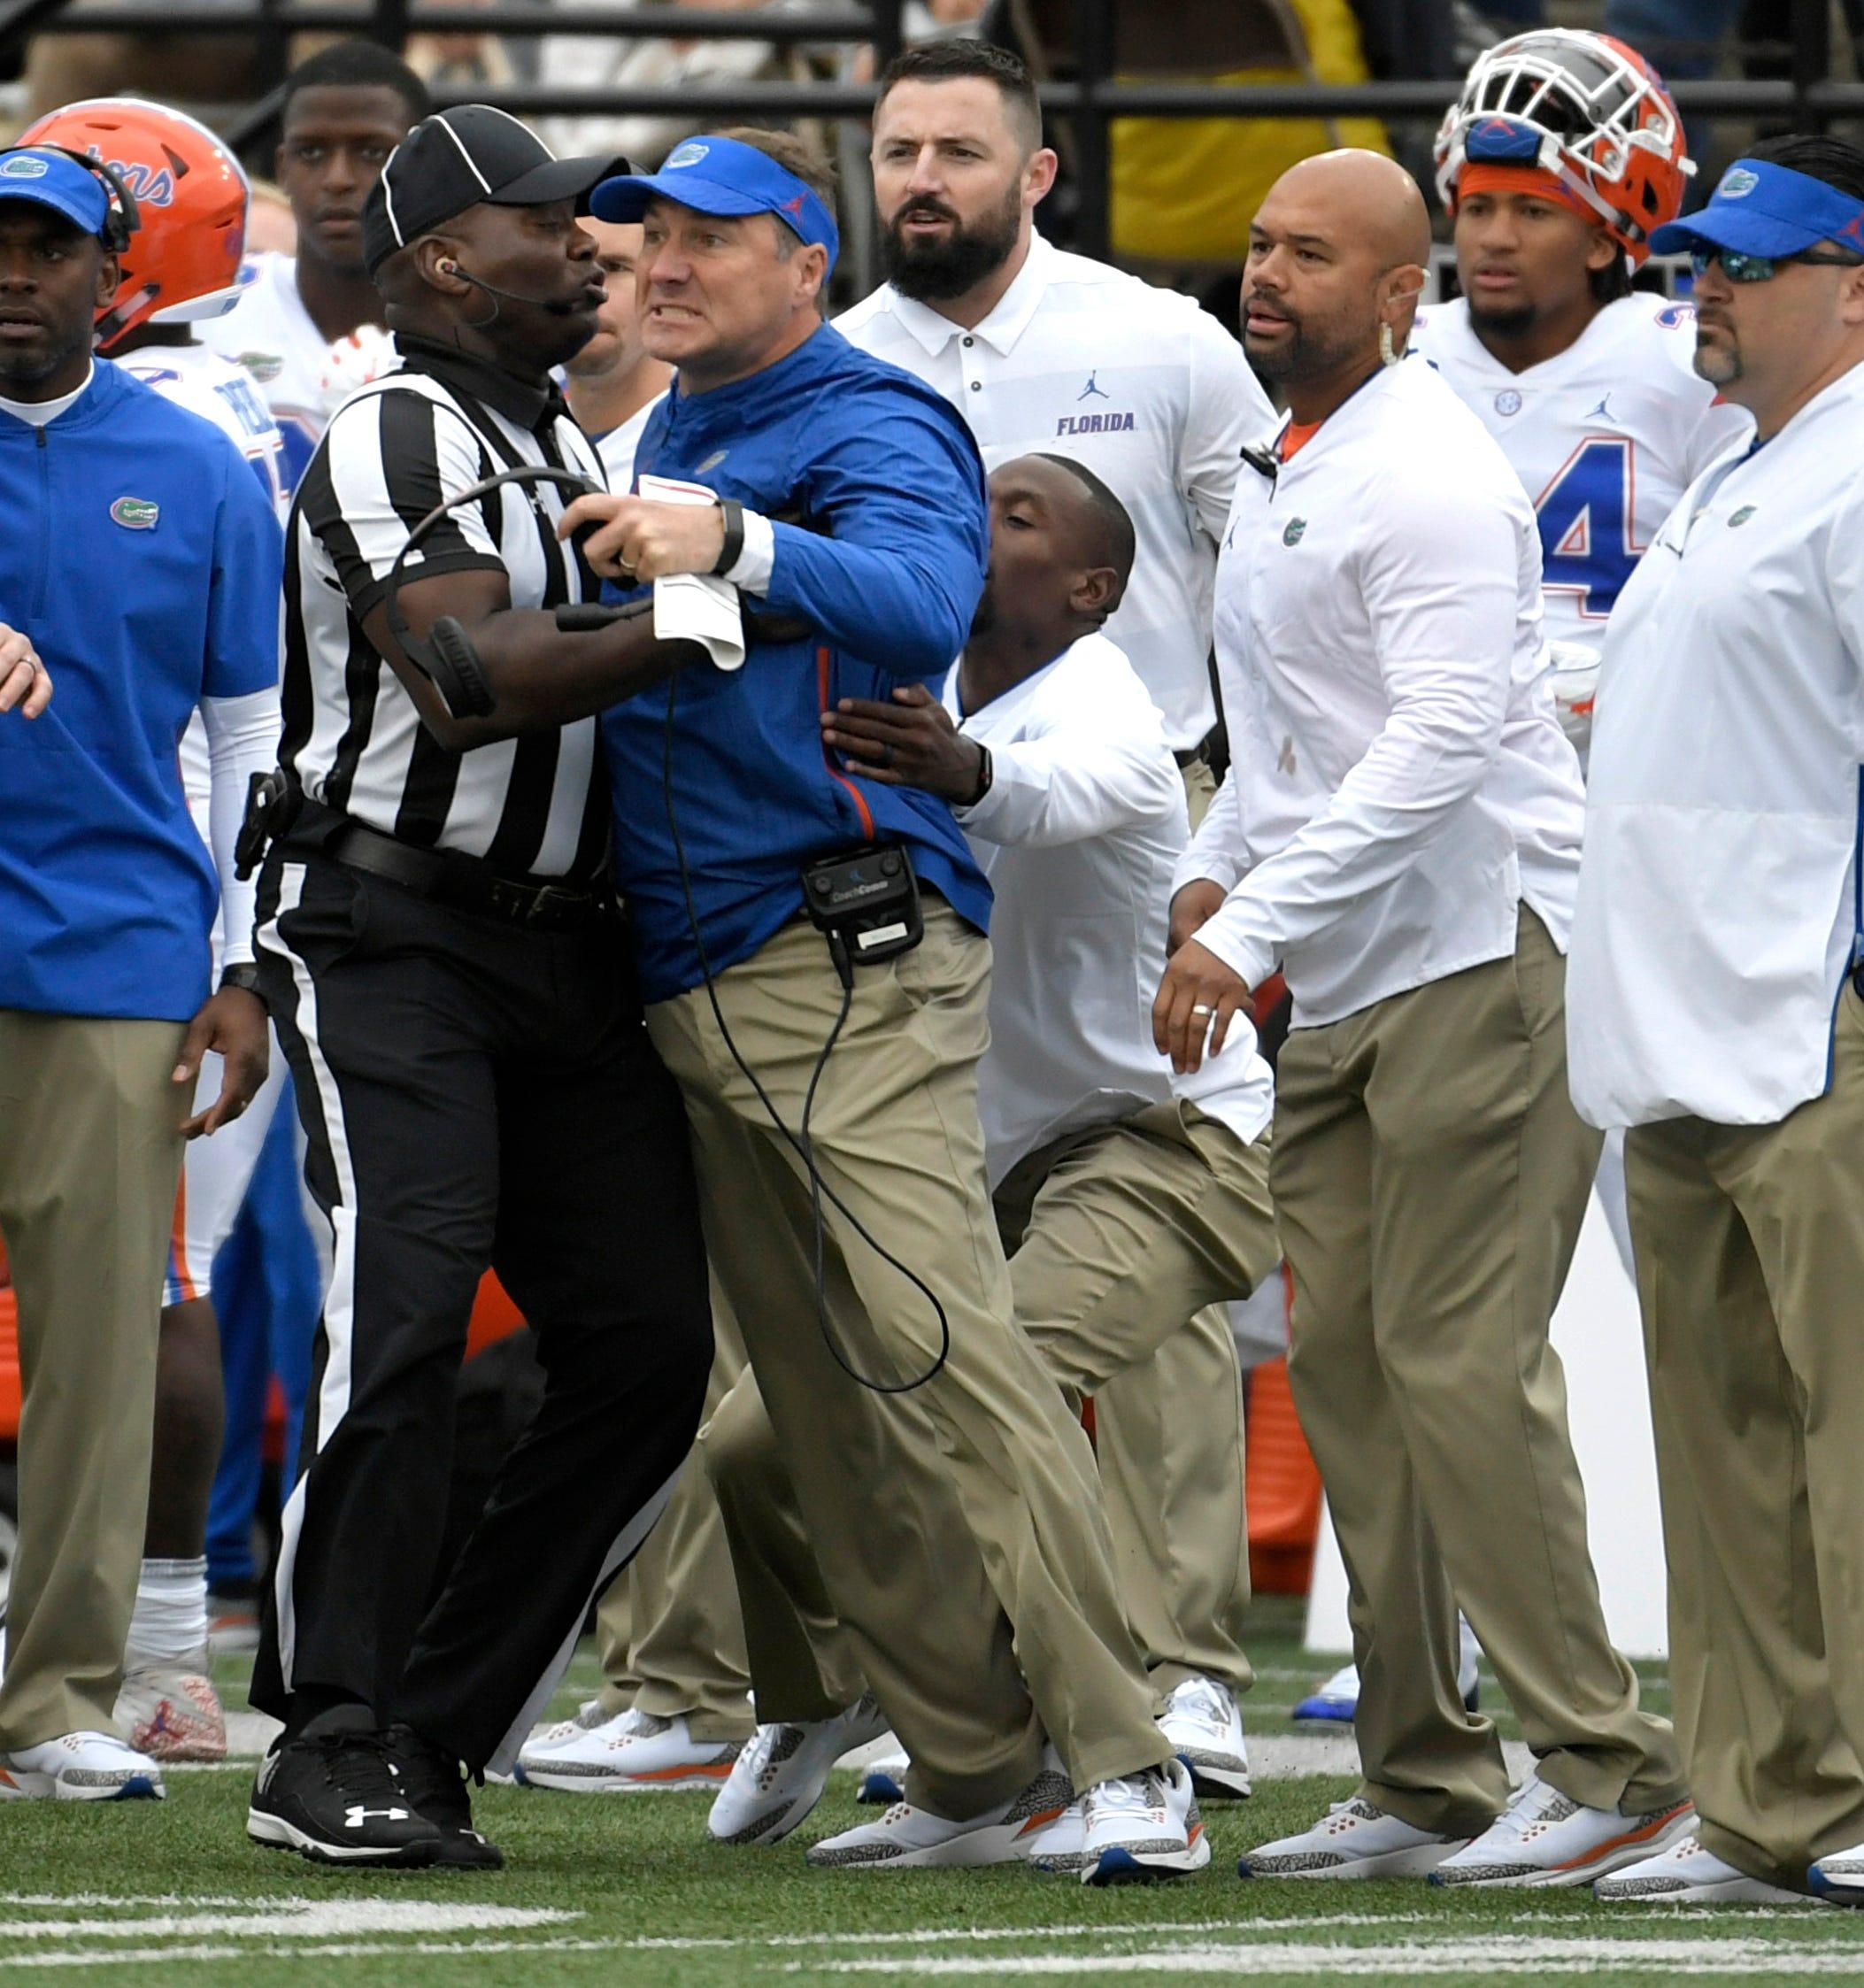 Vanderbilt Vs Florida Football Commodores Loss A Blown Opportunity